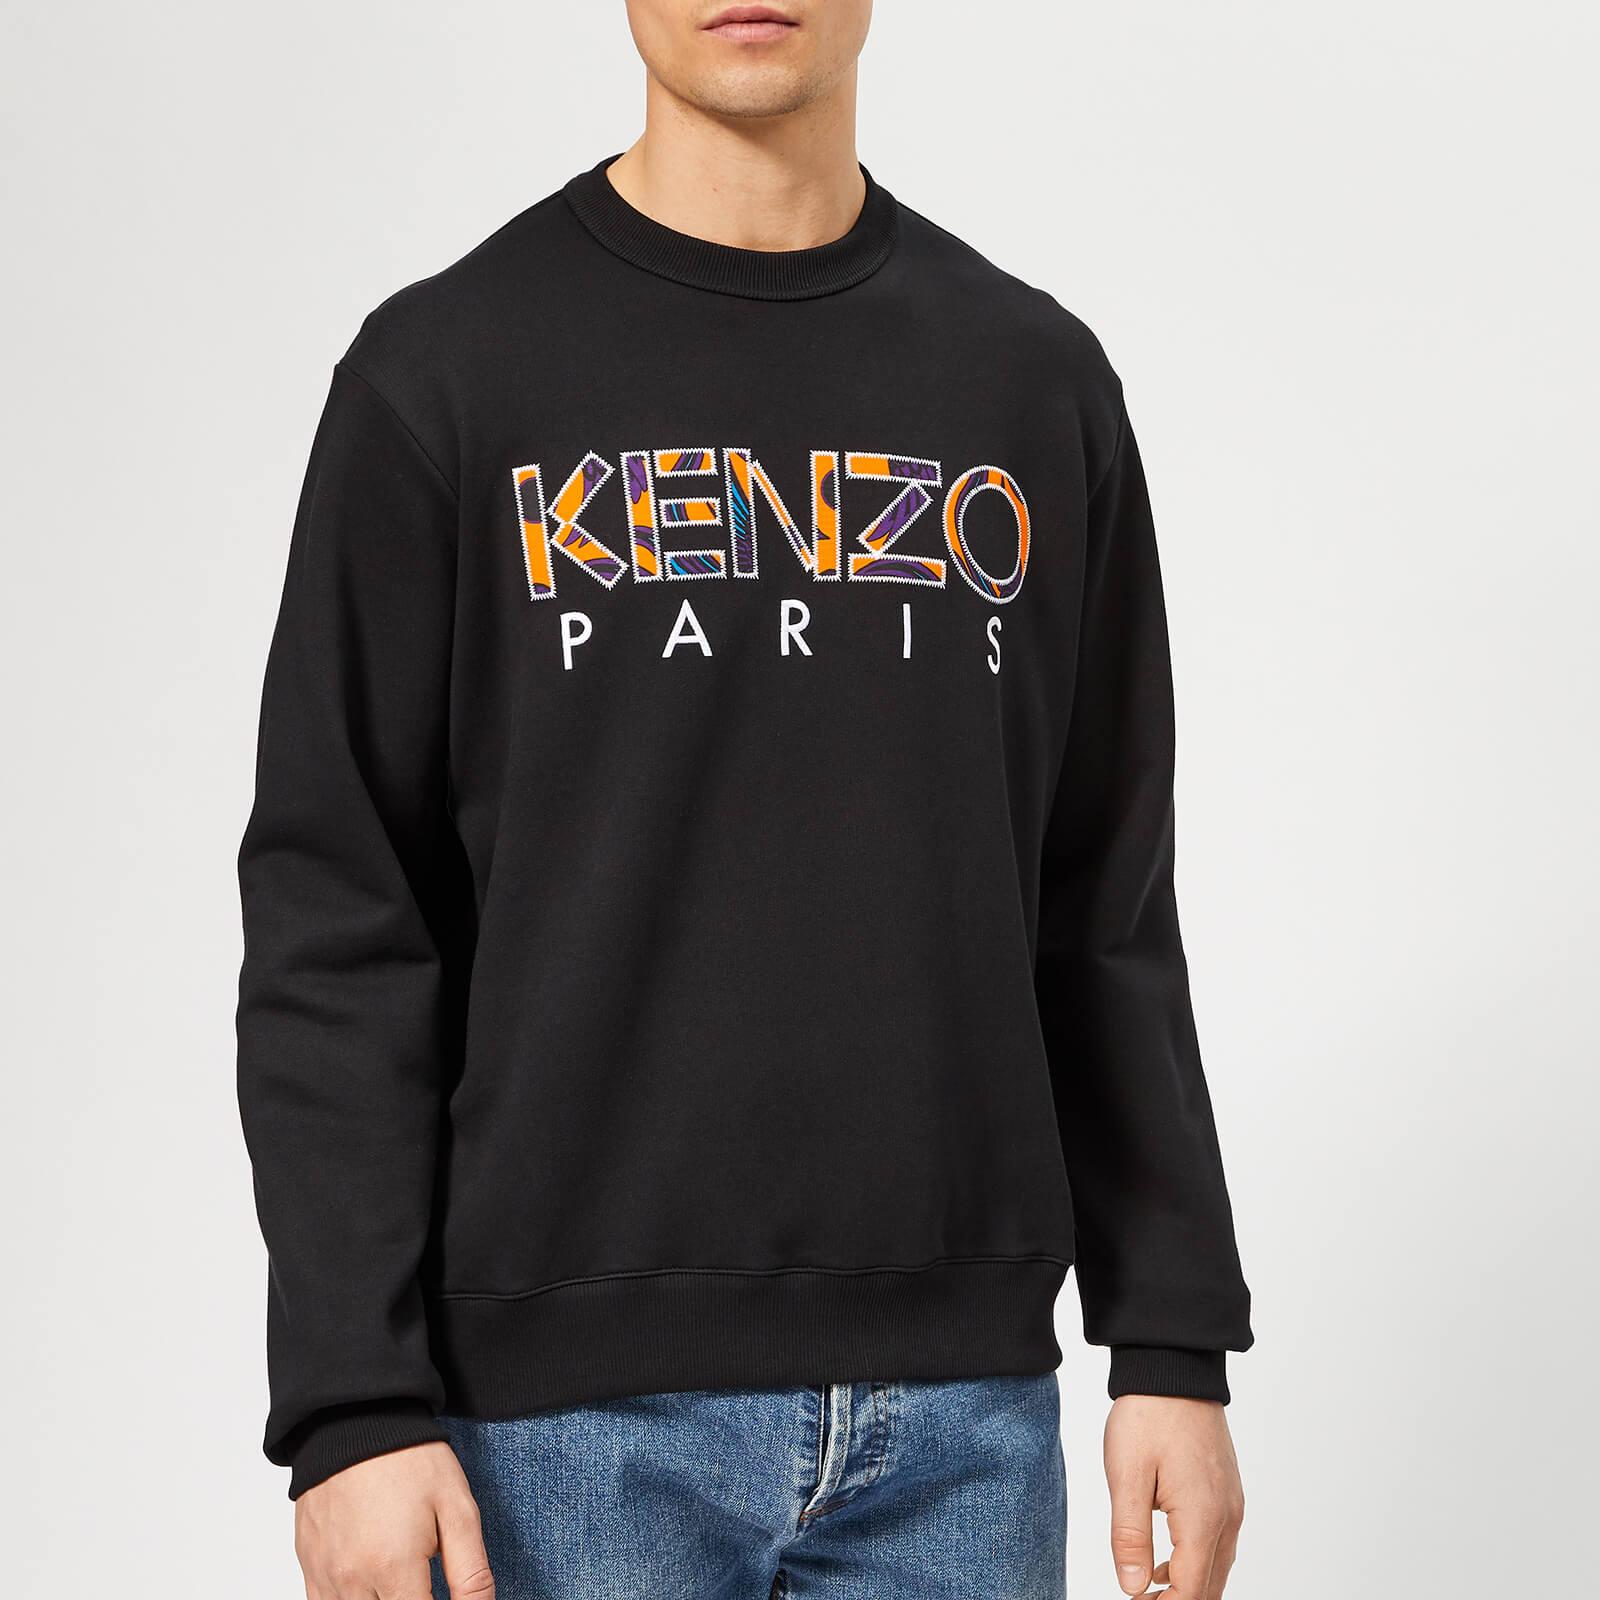 f79b70d6 KENZO Men's Pattern Logo Sweatshirt - Black - Free UK Delivery over £50